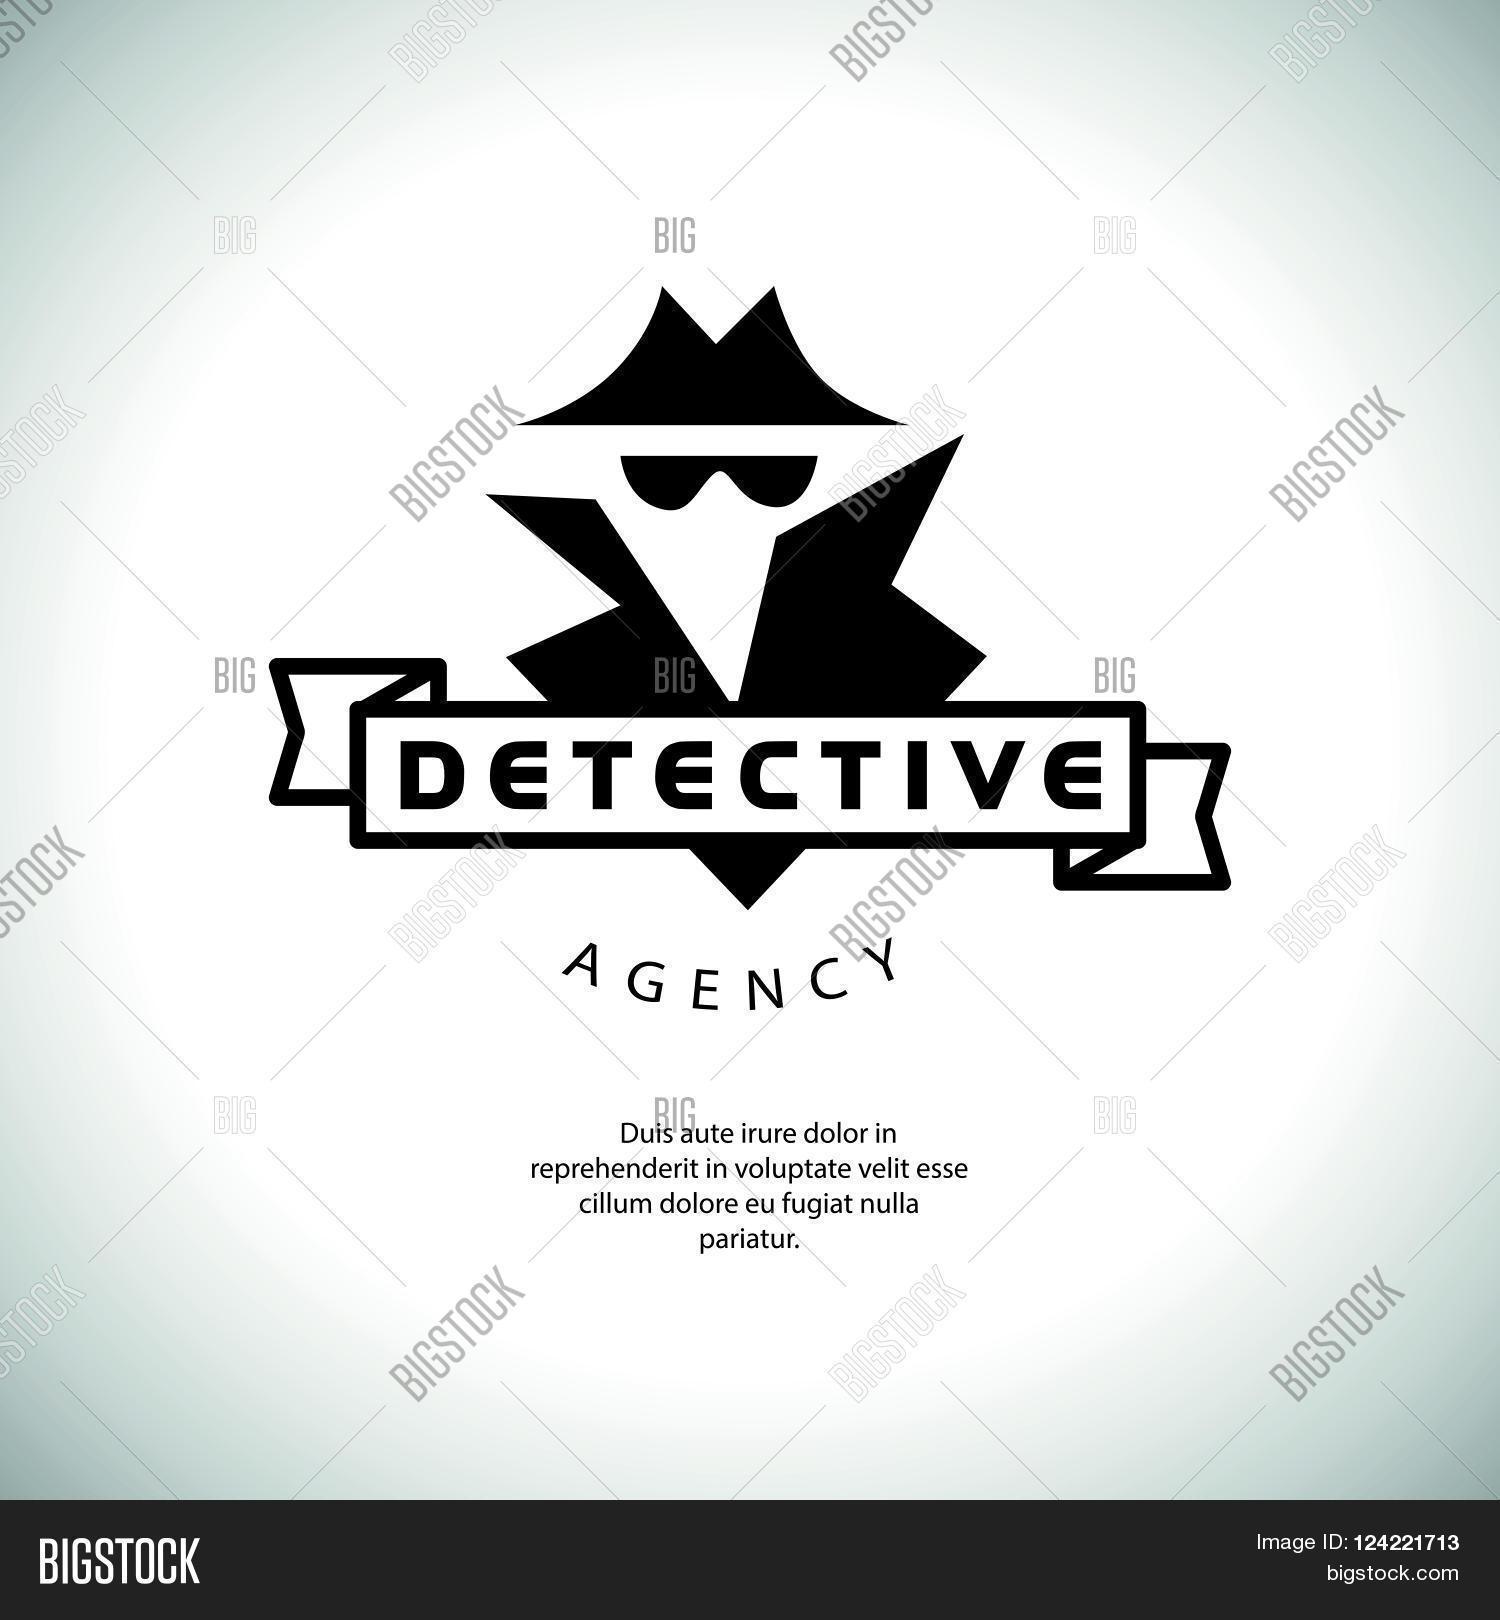 Flat Detective Agency Logo Design Vector & Photo | Bigstock